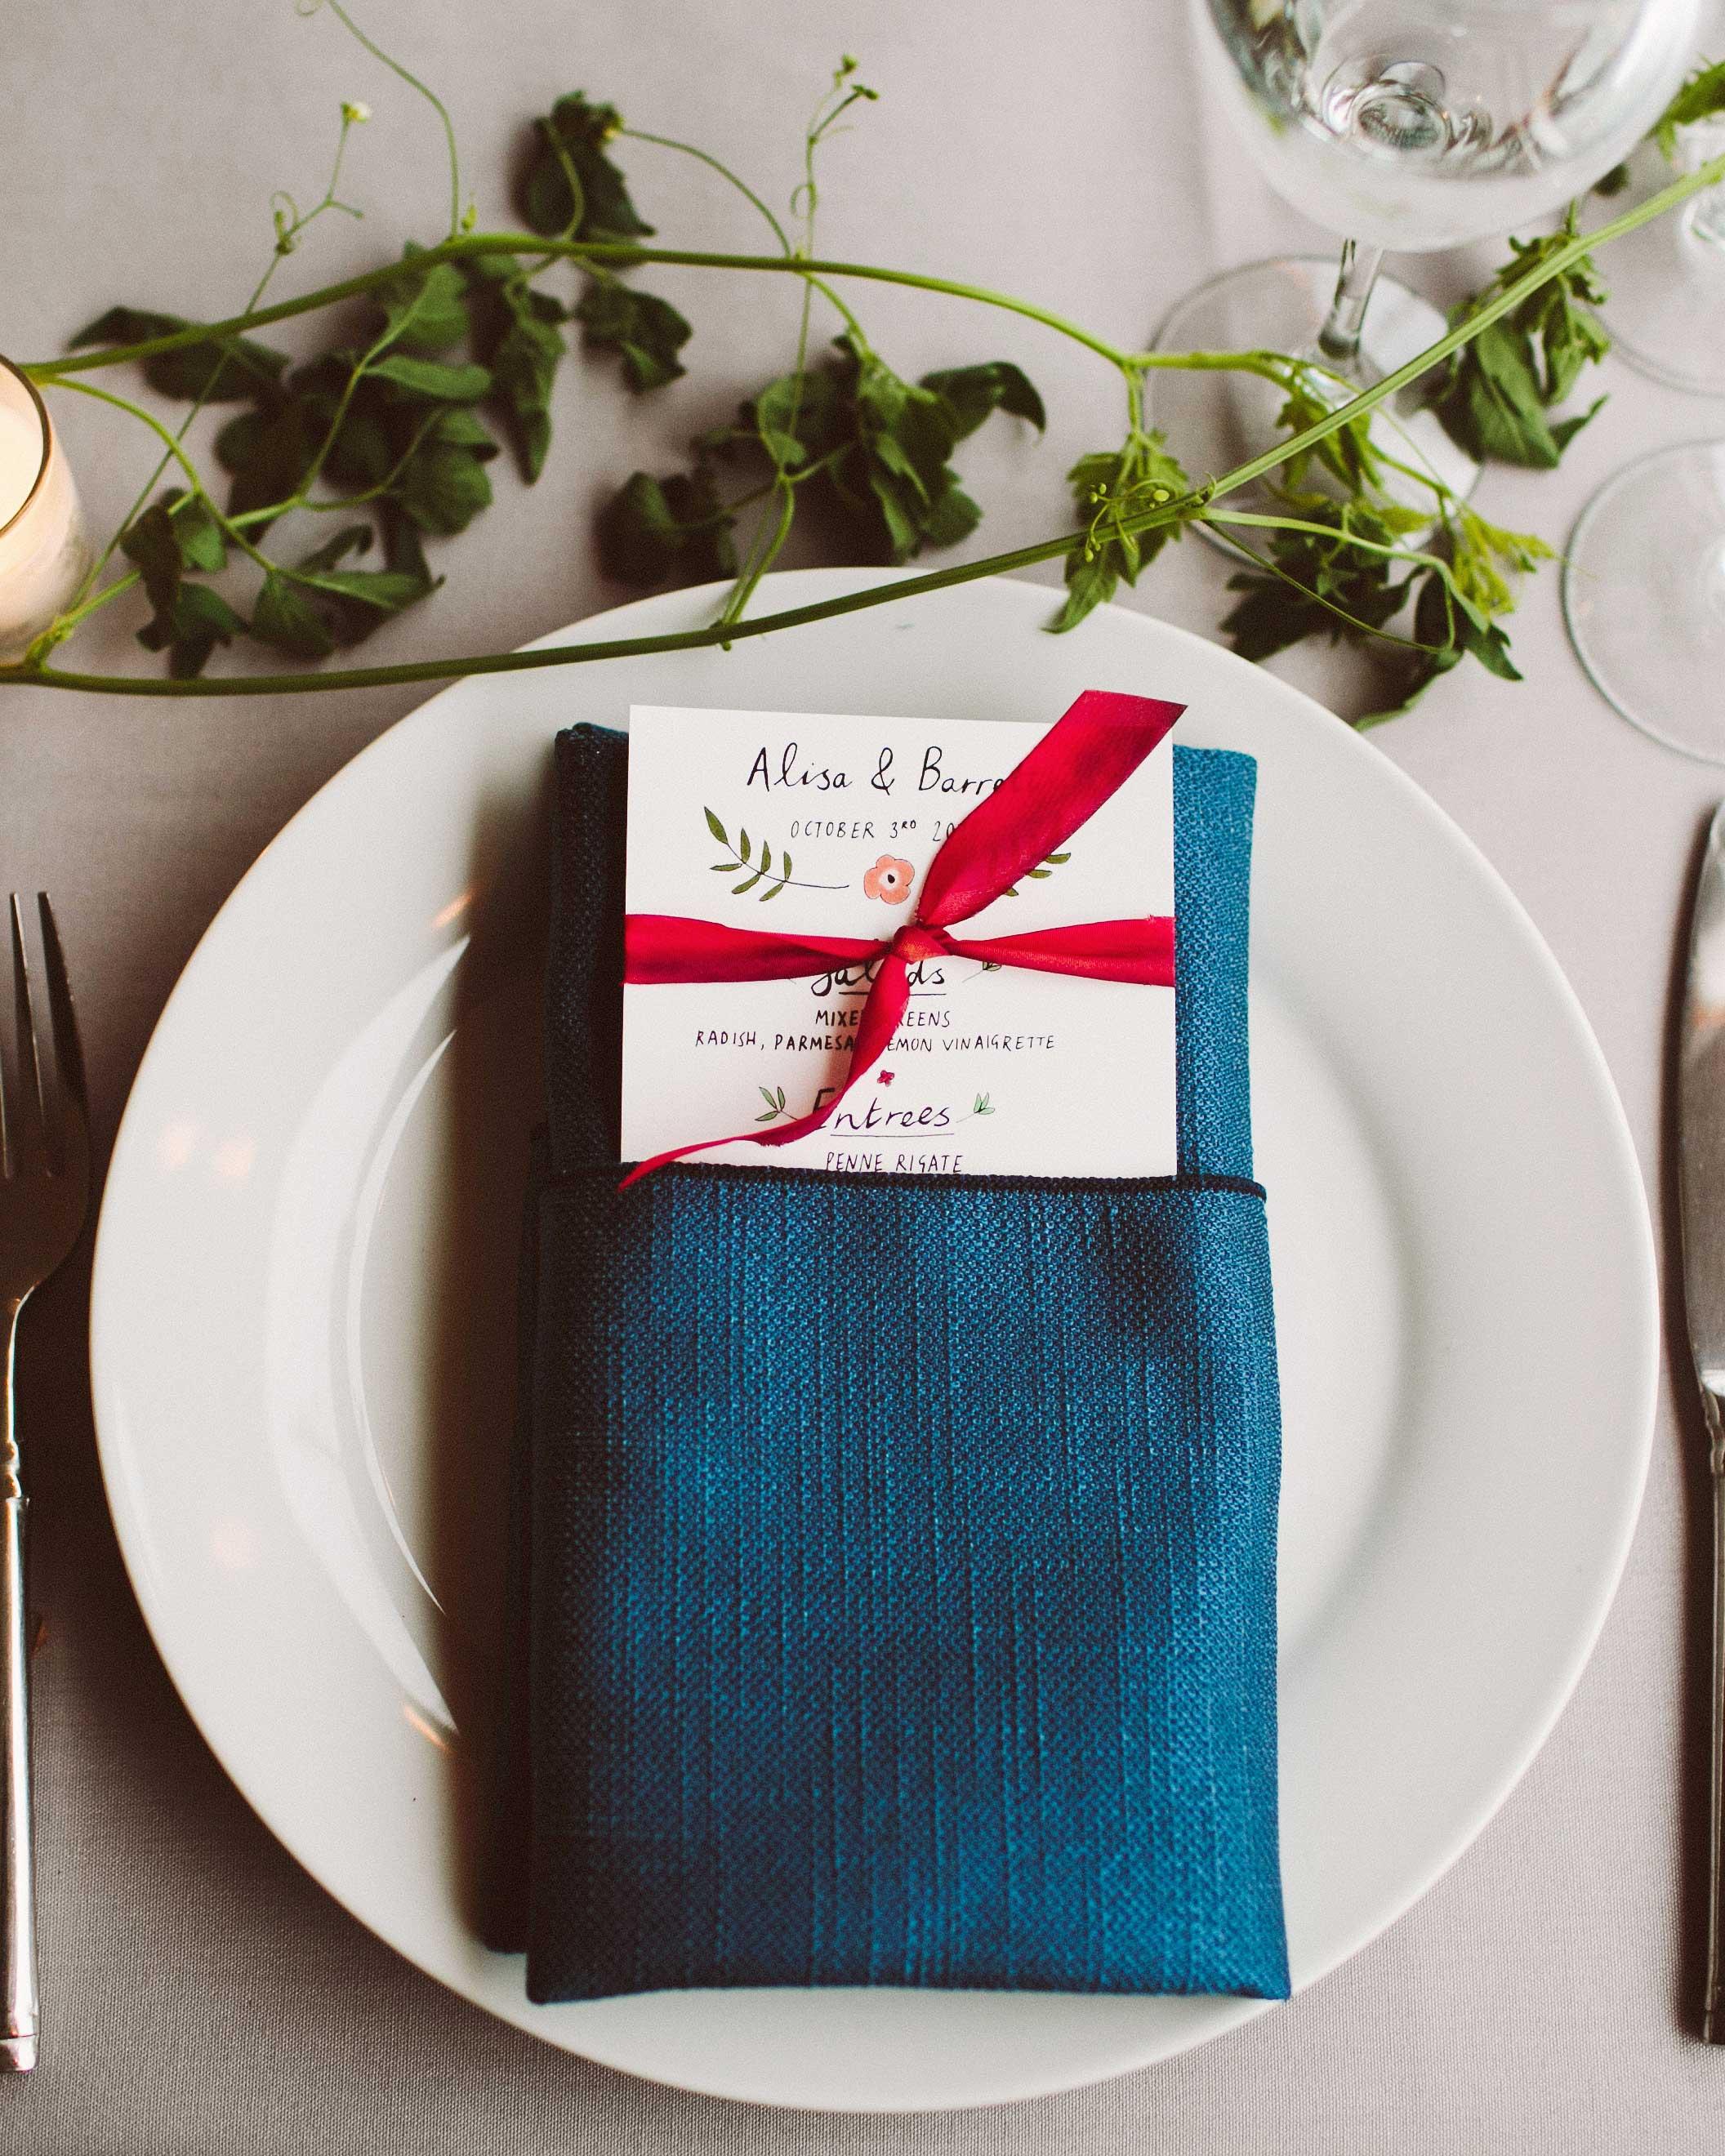 alisa-barrett-wedding-placesetting-1027-s113048-0716.jpg